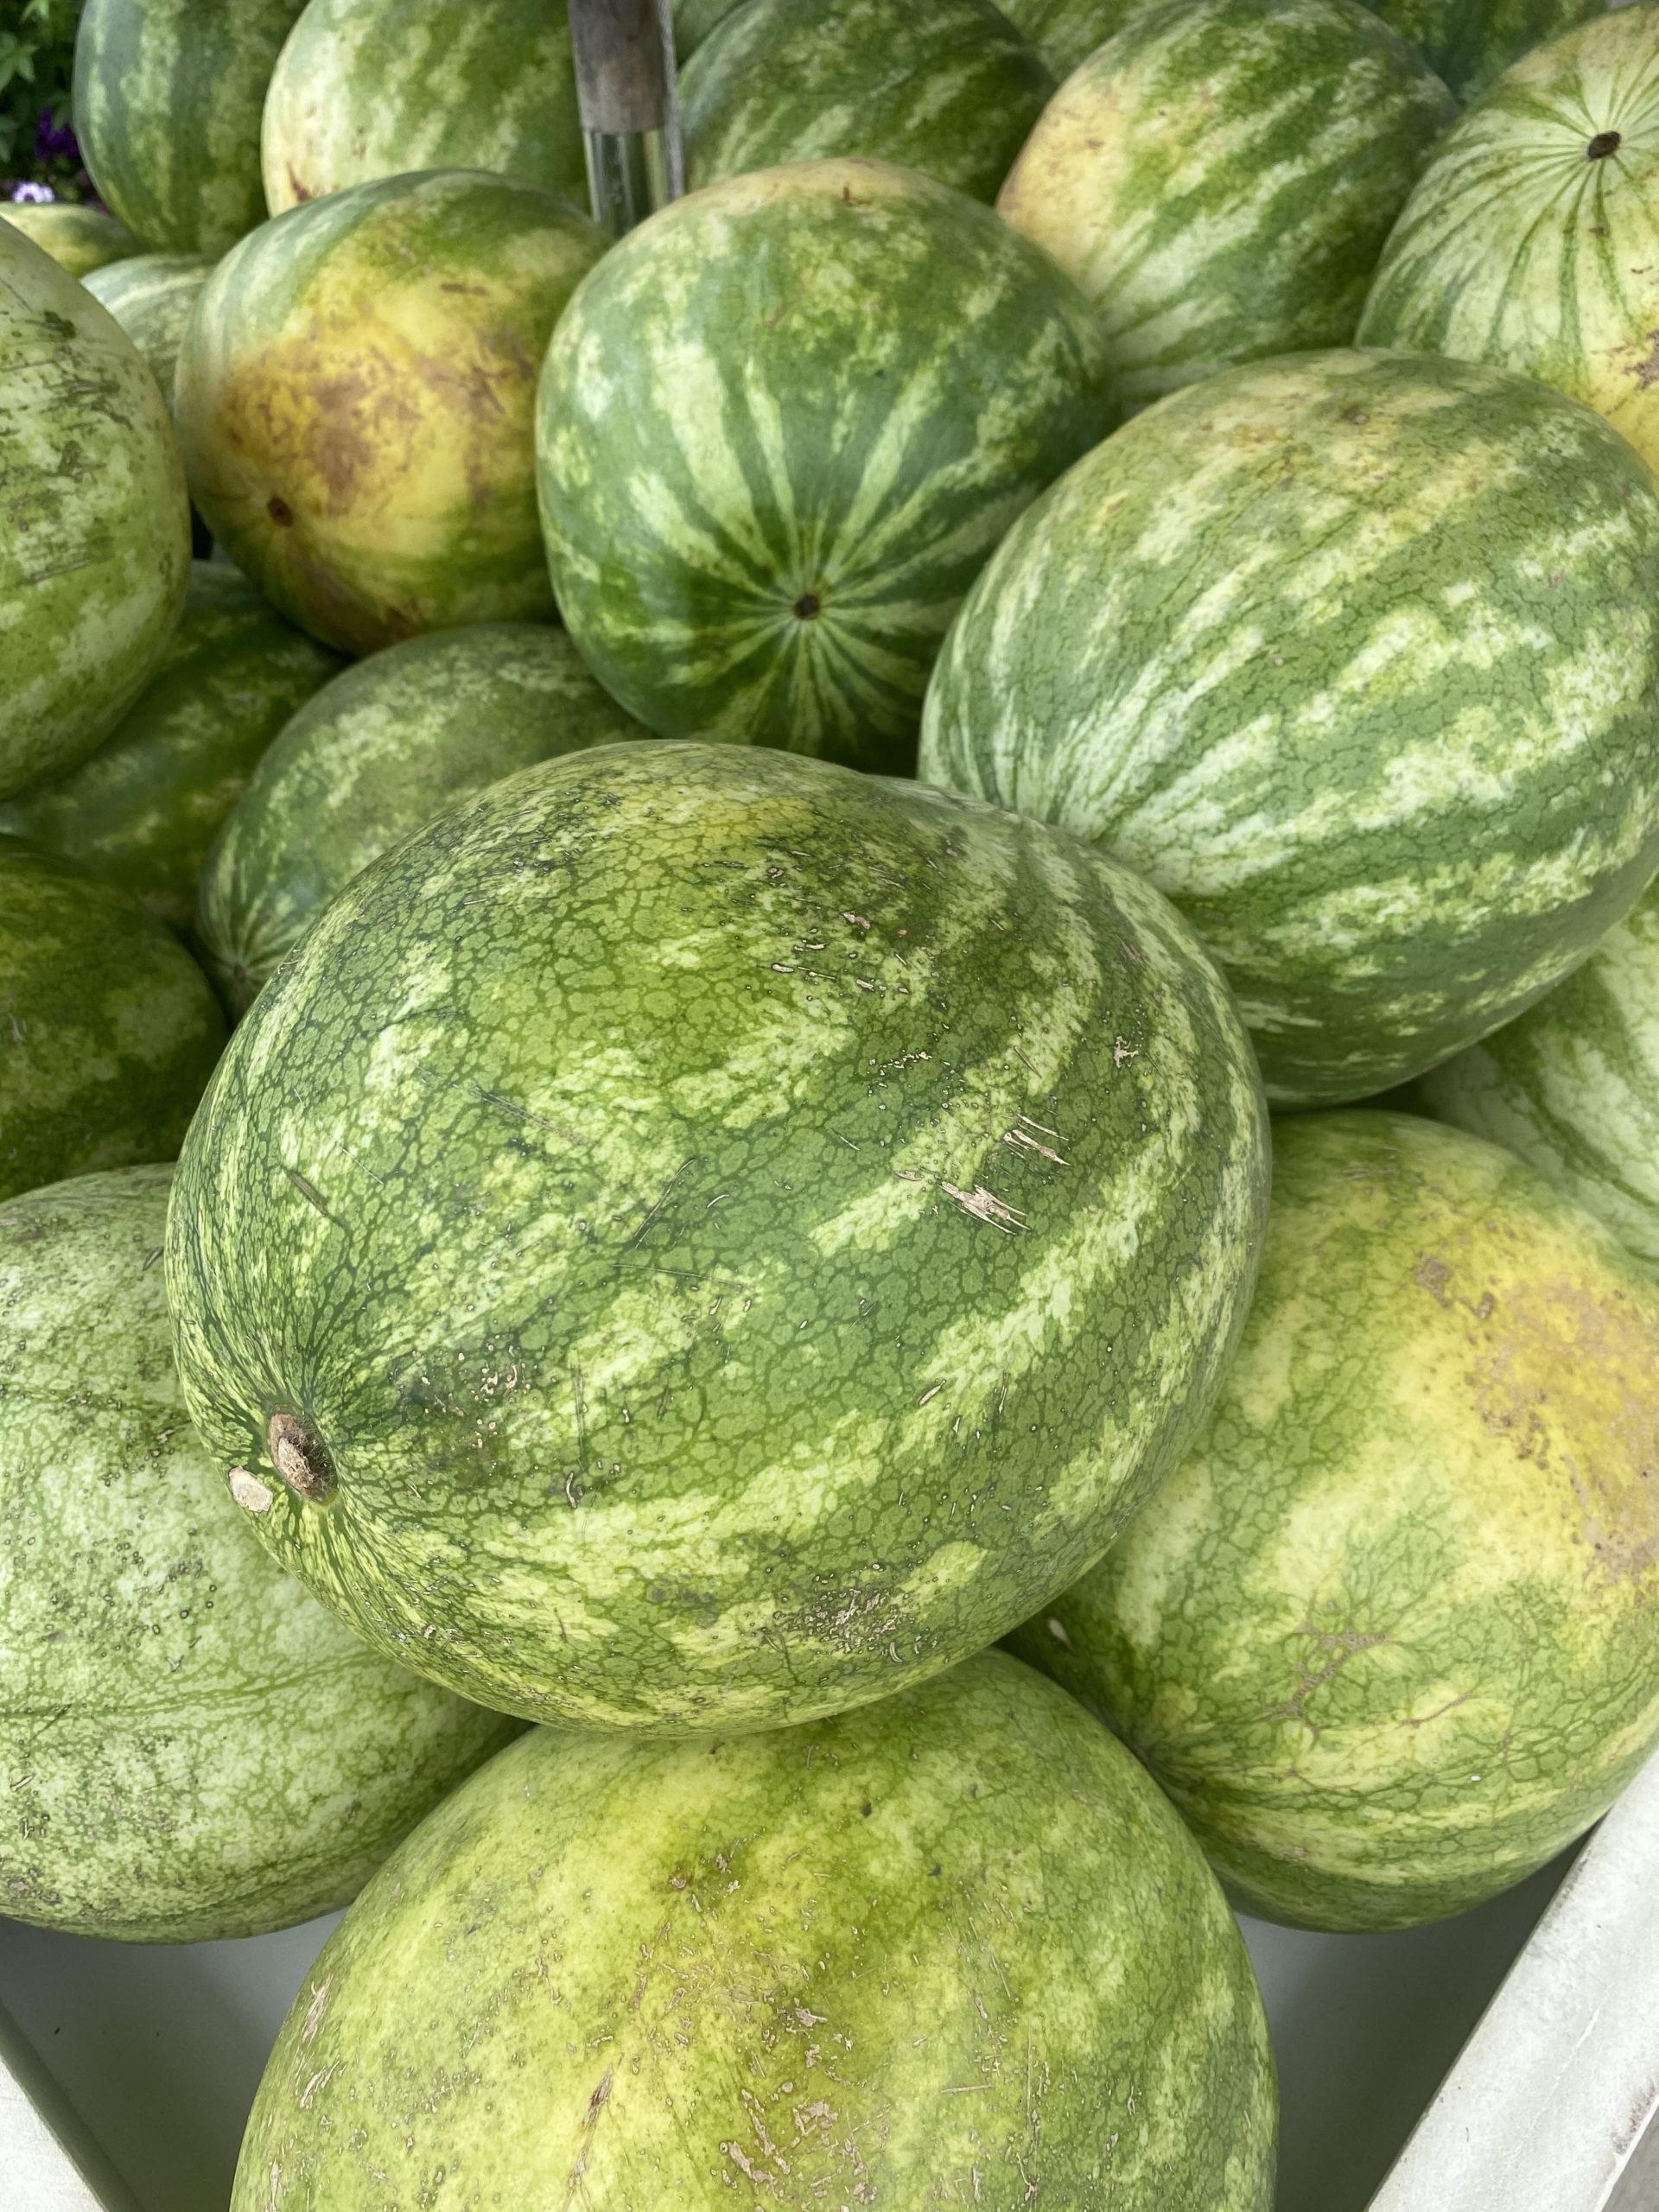 Halsey Farm's watermelons.     STEVEN STOLMAN